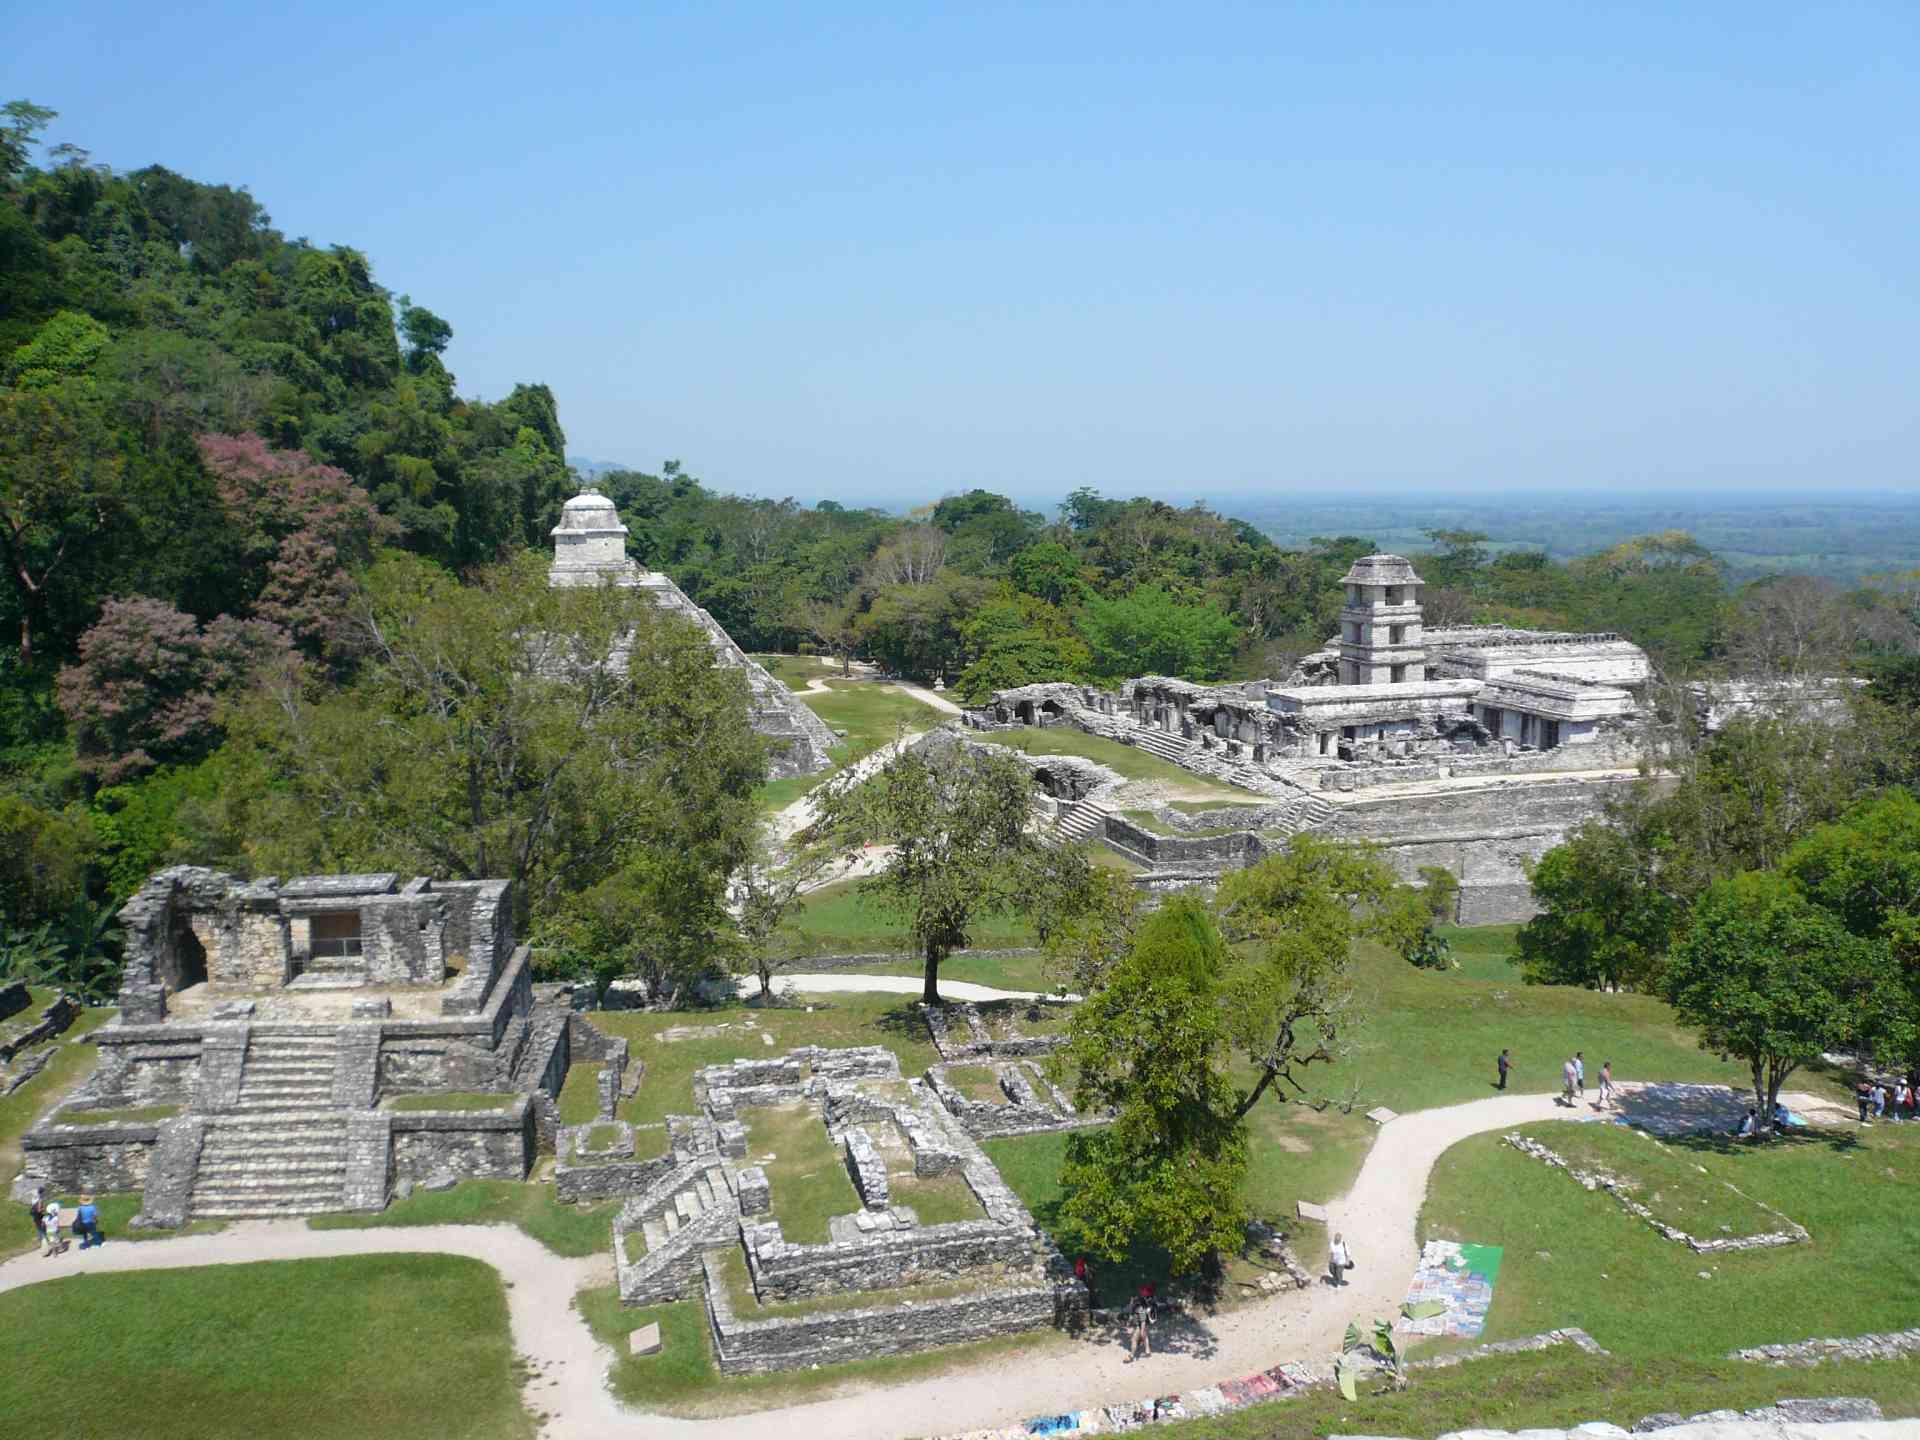 Palenque, Mexico by Marion Bunnik